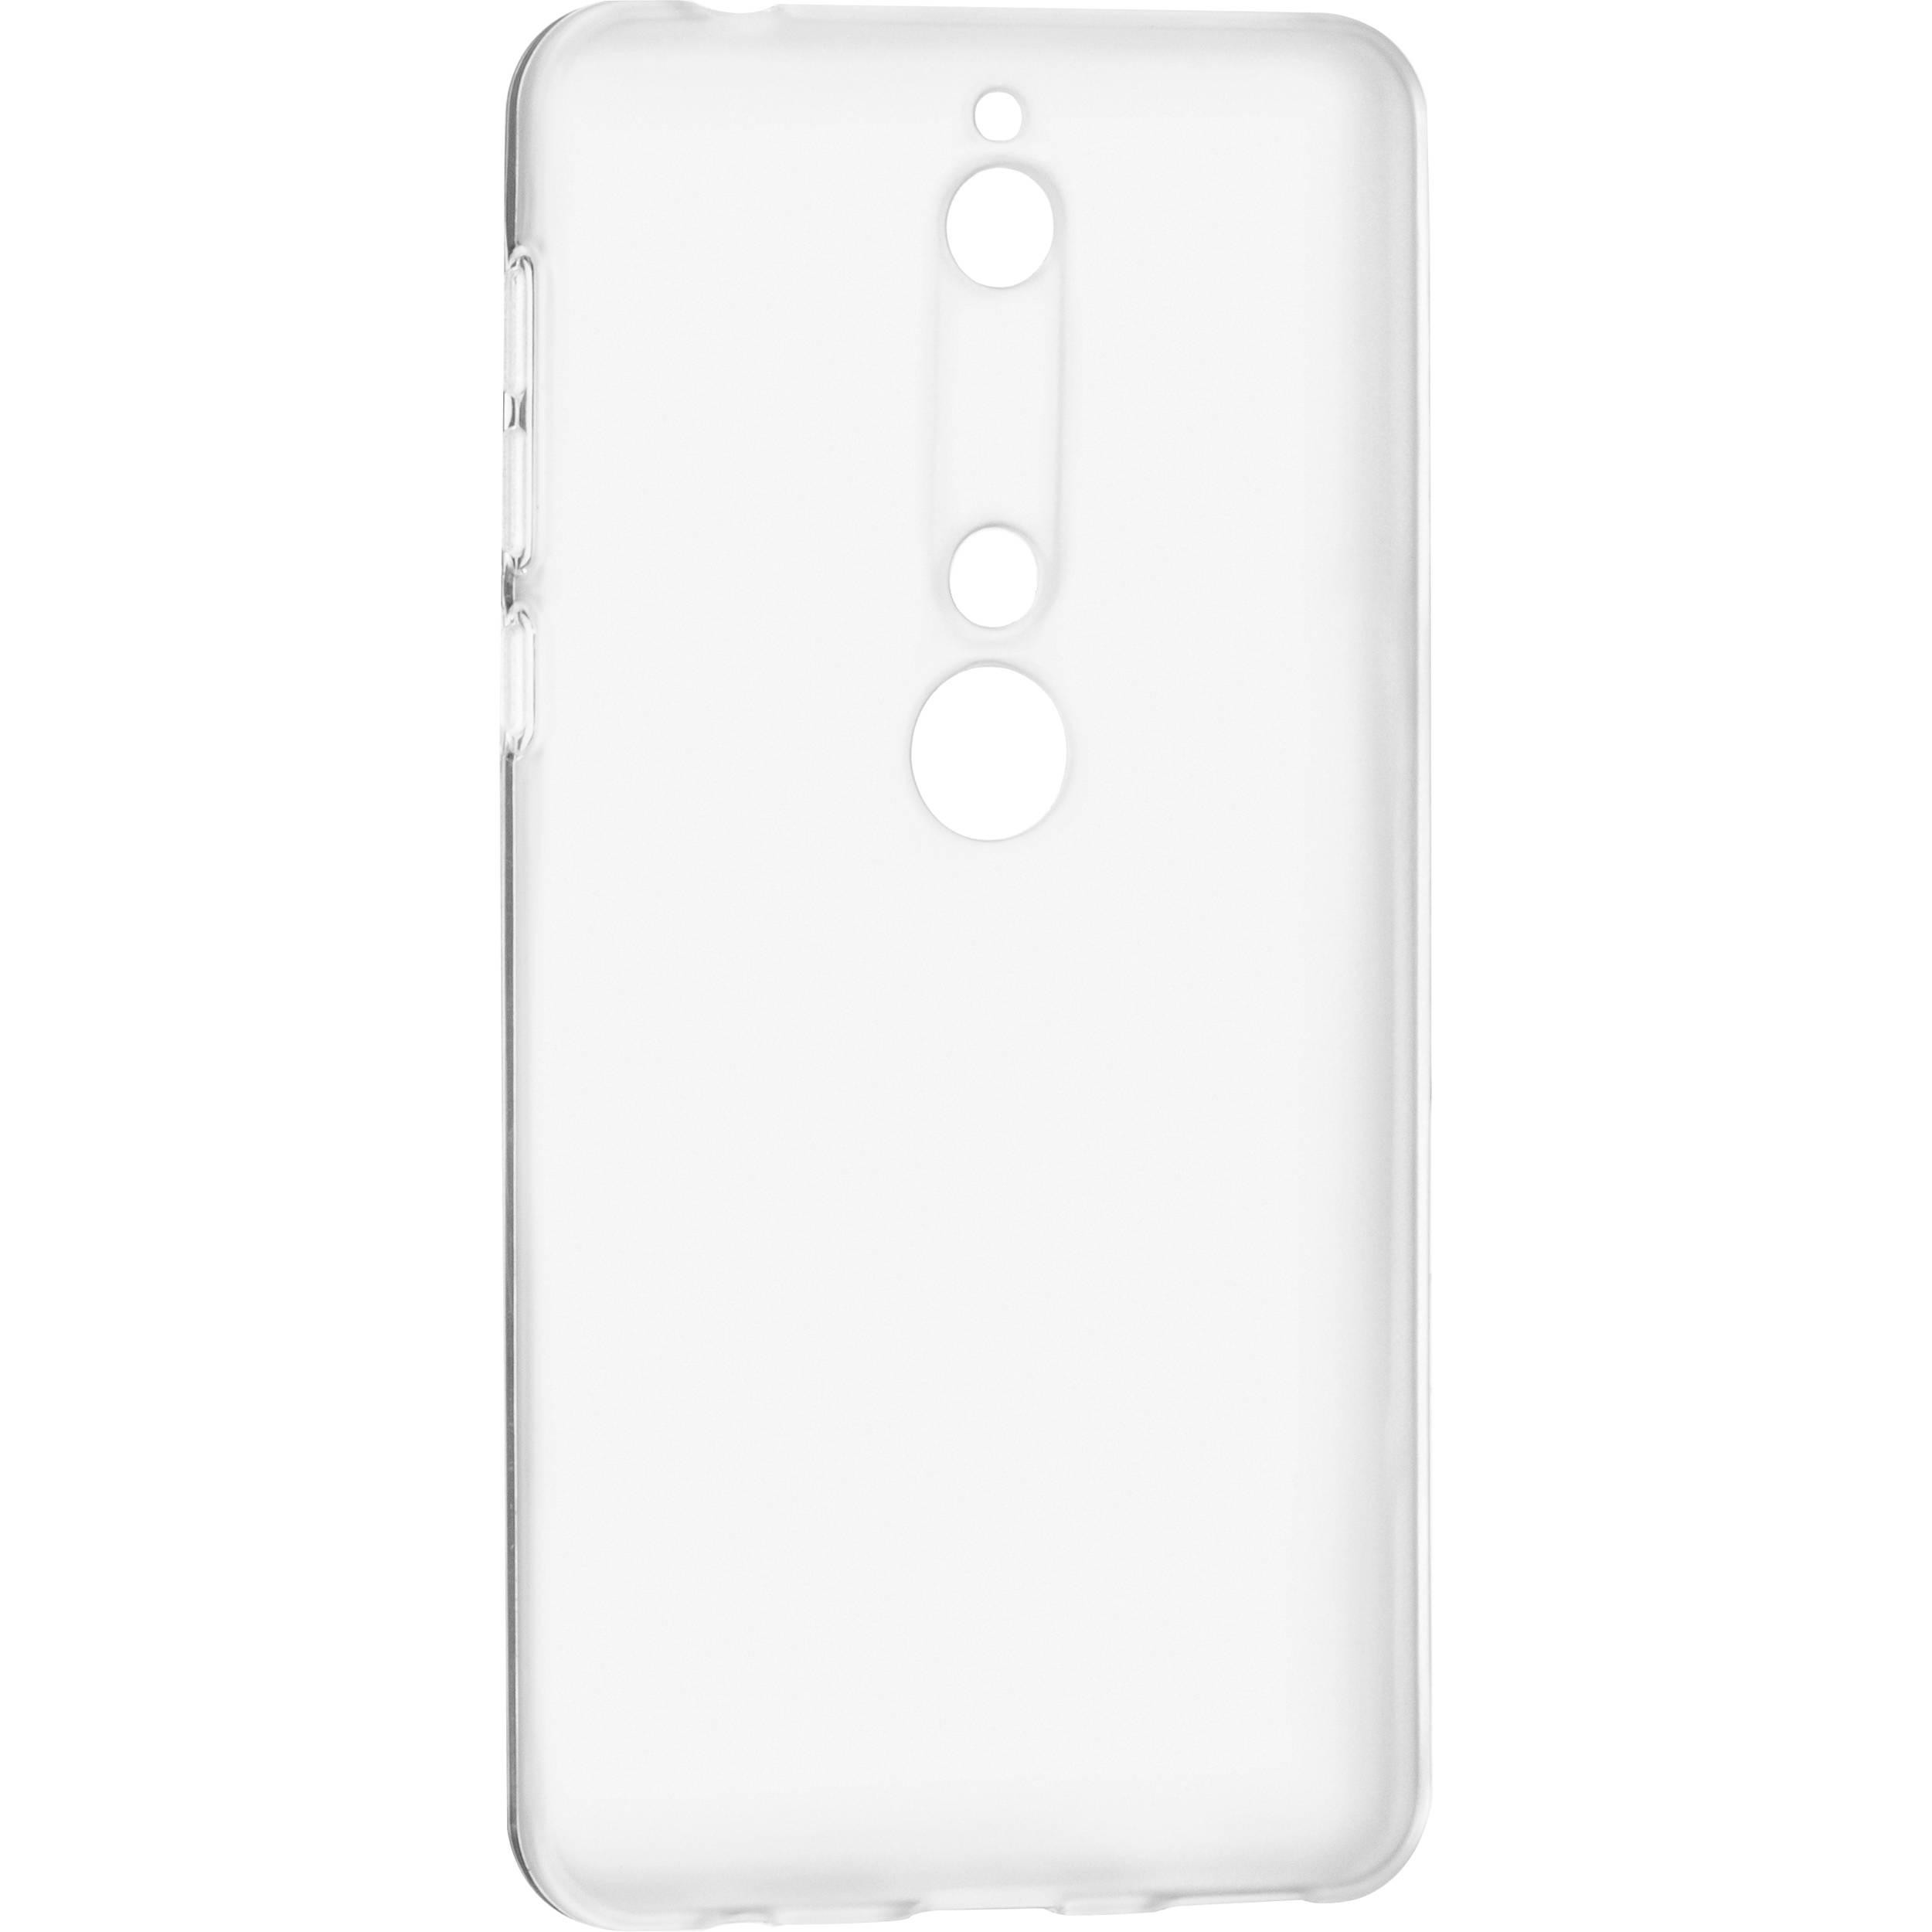 new style 3879e 16291 AVODA Nokia 6.1 Clear Case Protector